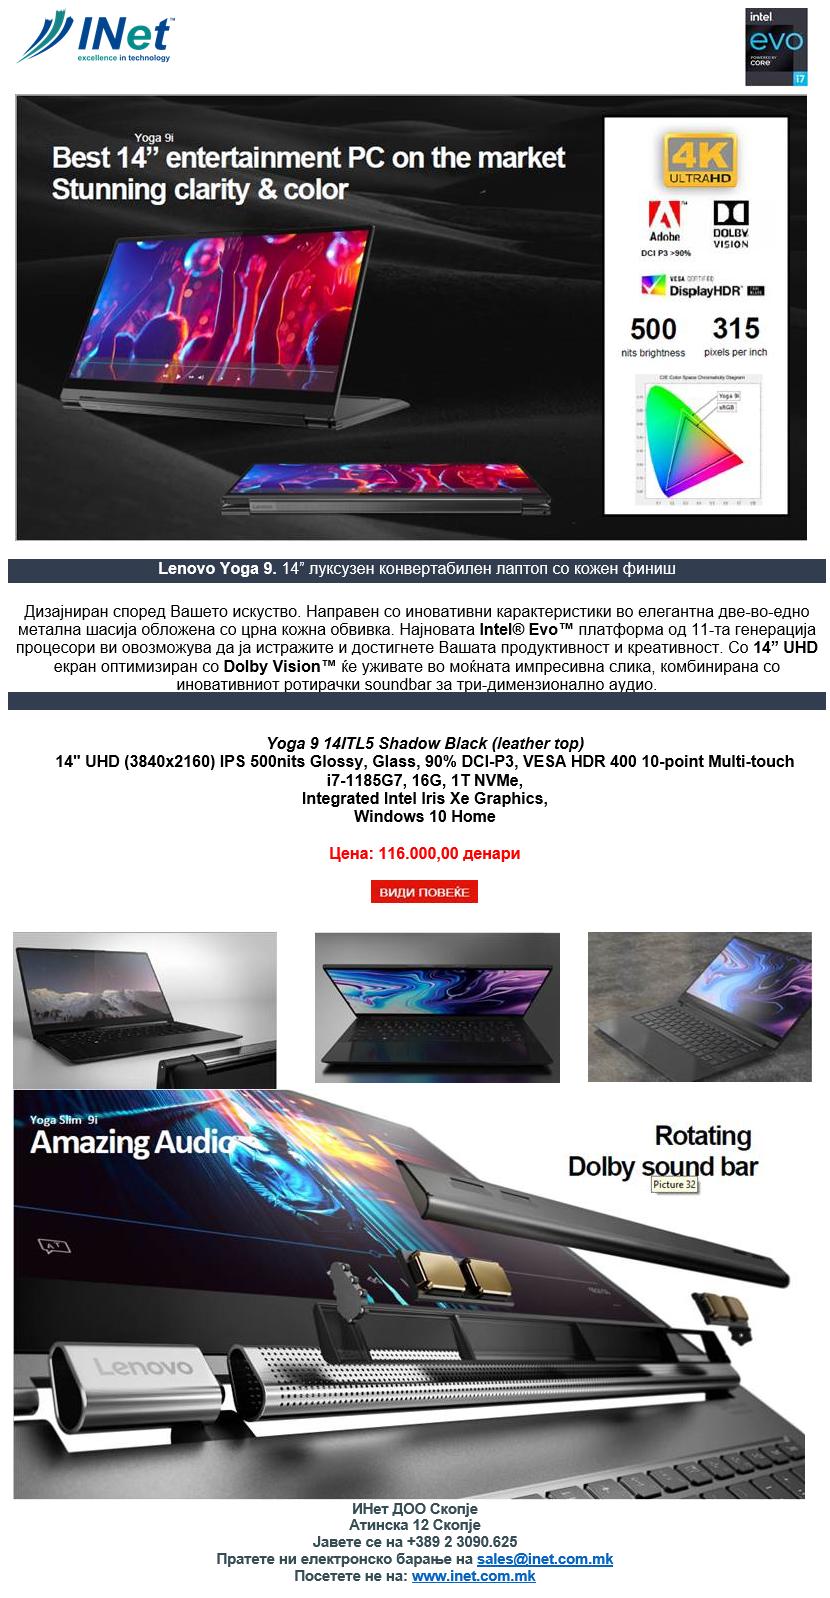 Lenovo PROMO YOGA 9 - 14 luksuzen konvertabilen laptop